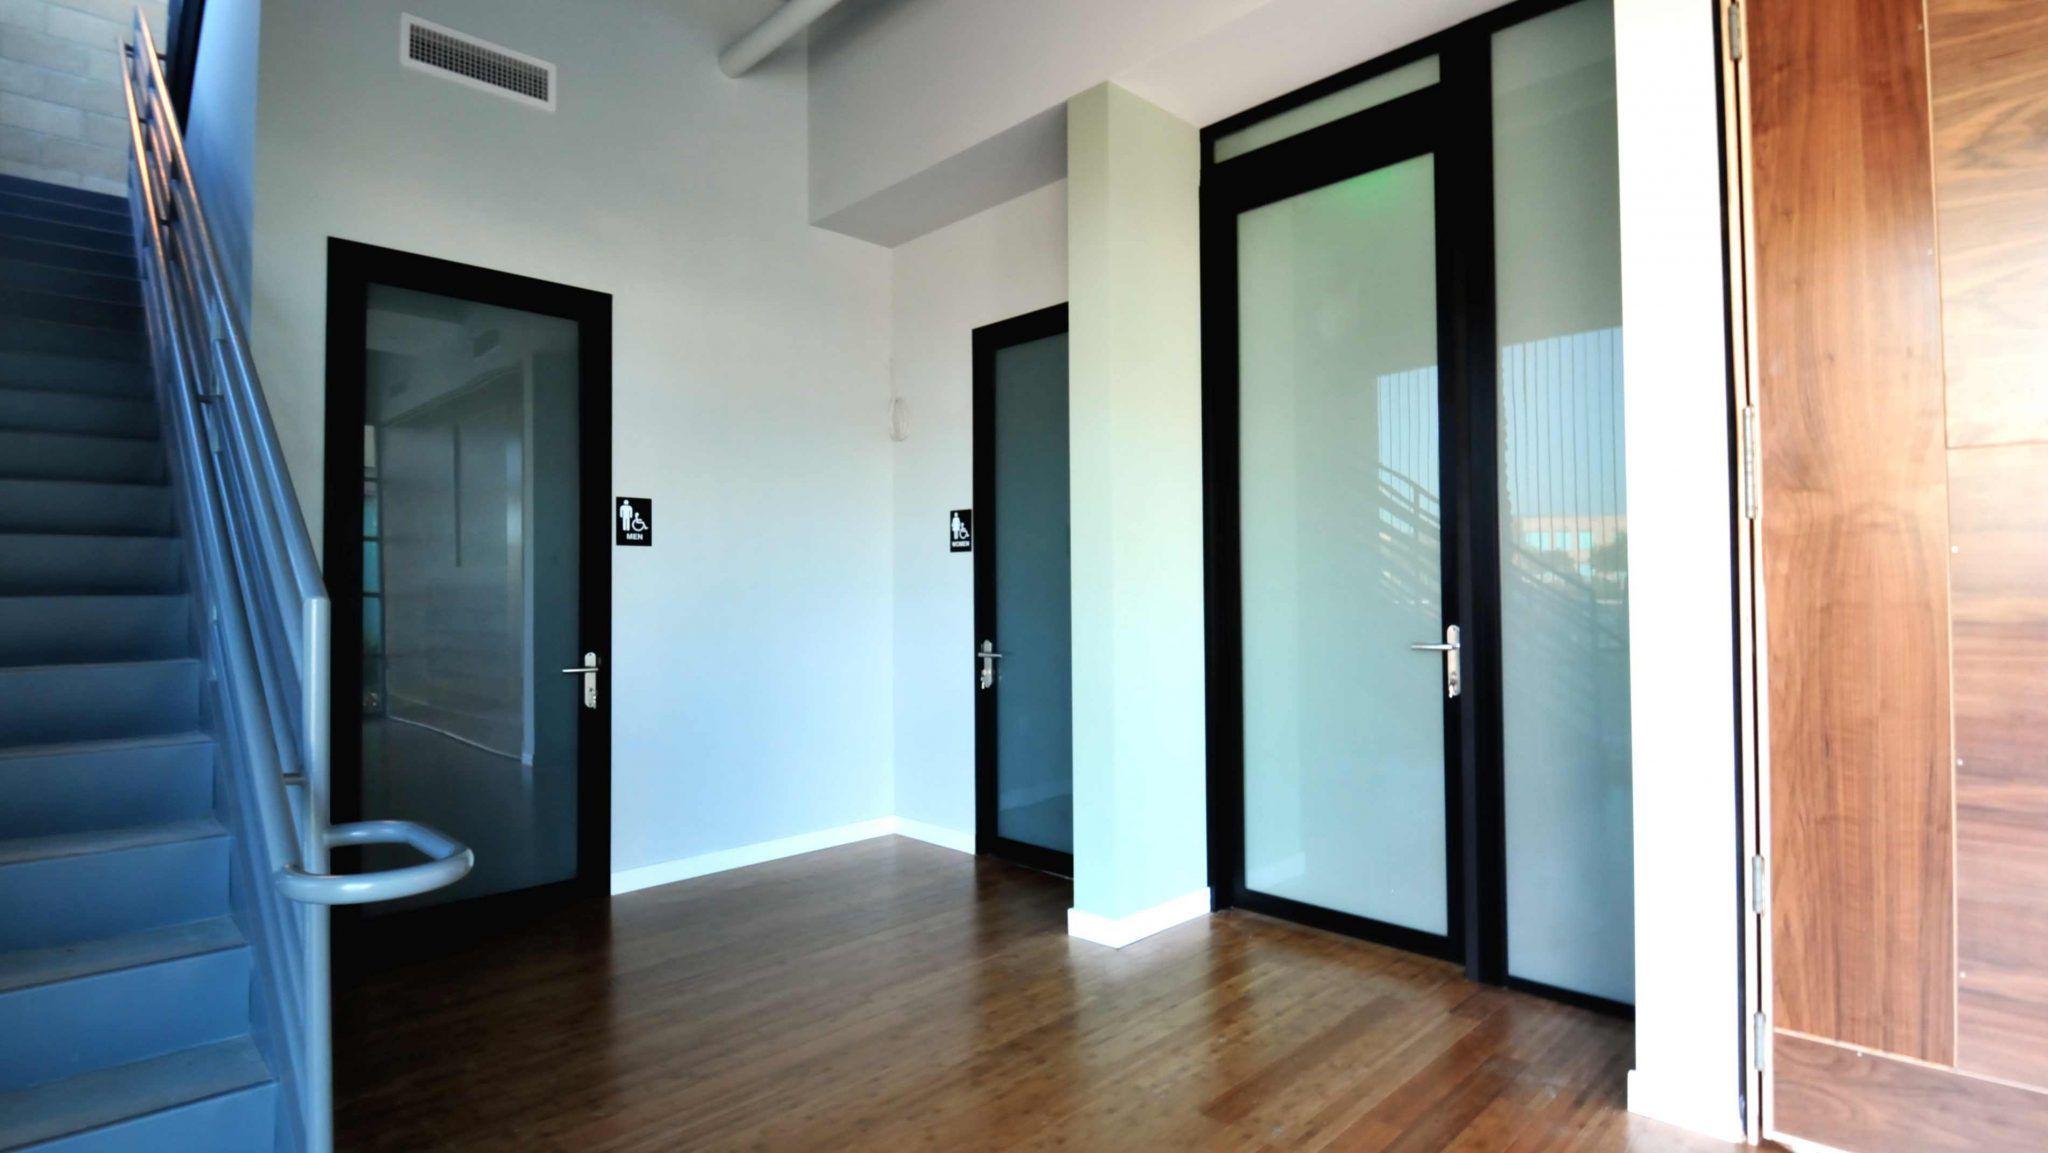 Commercial Restroom Entry Swing Door Project | Space Plus ...